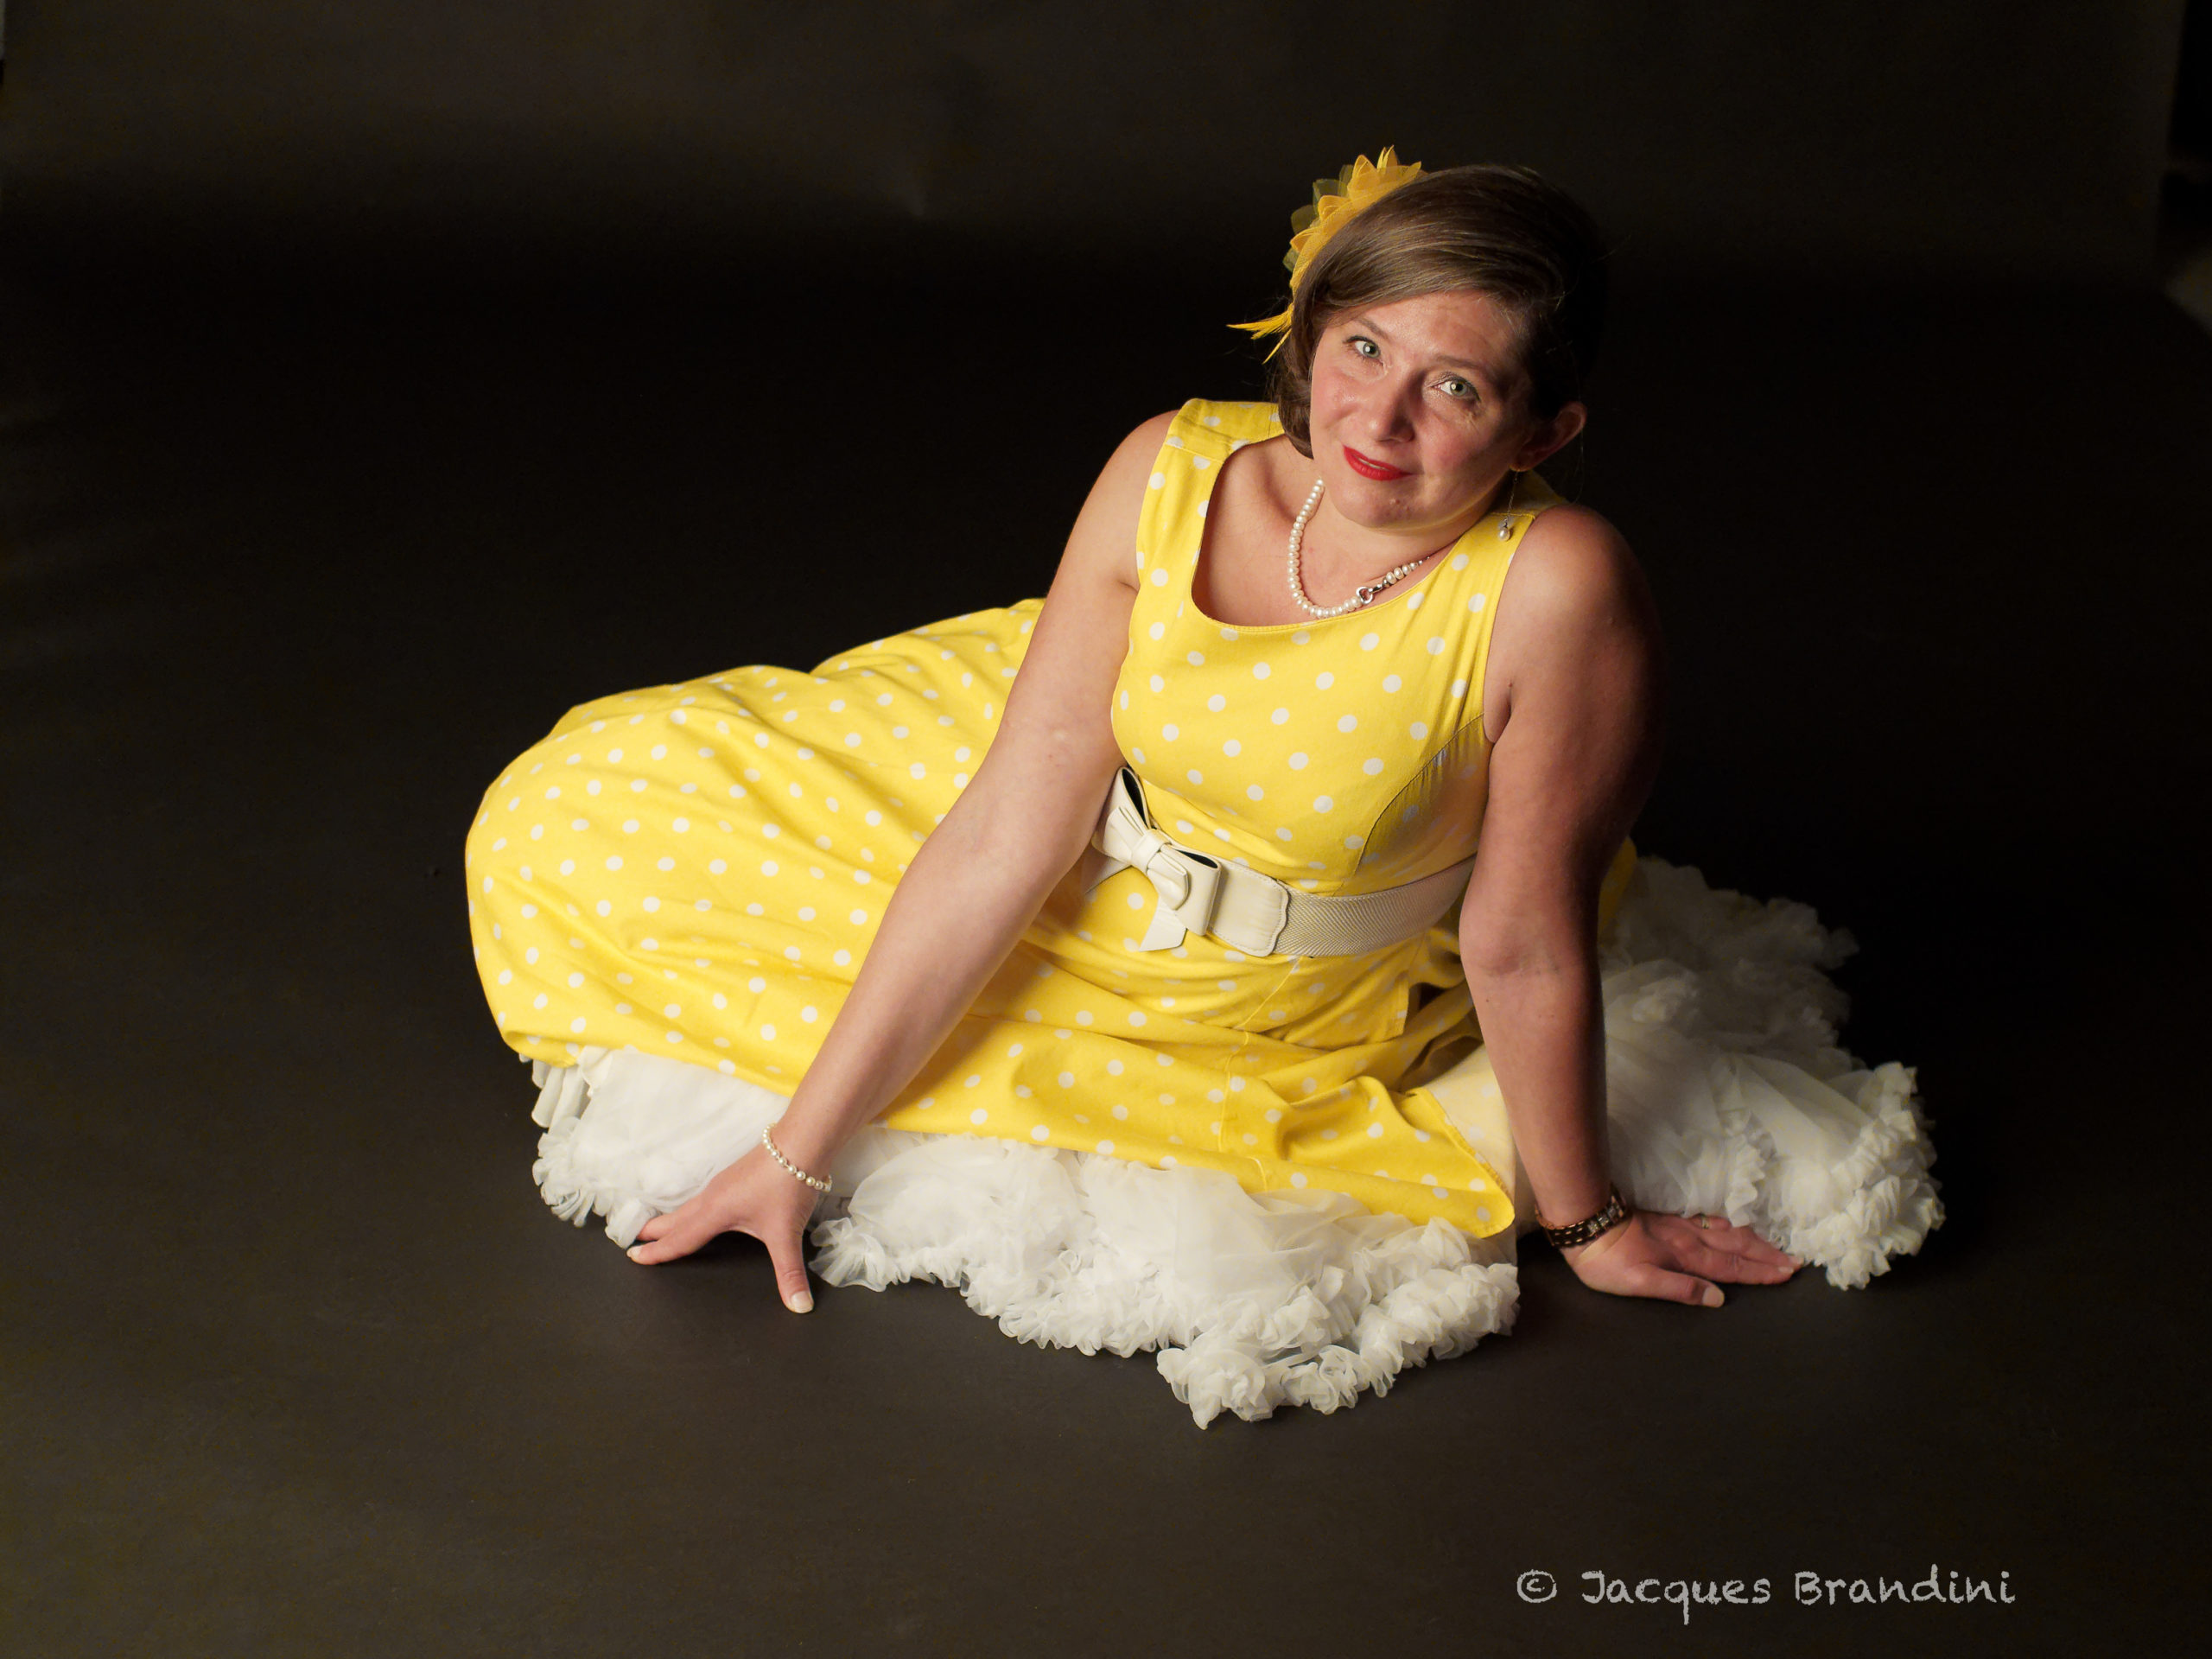 Robe Rayon de Soleil - Model : Cendrine Miesch dite LaPtiteAlsacienne - Photo de Jacques Brandini - Marque robe jaune : Hearts & Roses - Magasin : Sweet Candy Shop à Molsheim